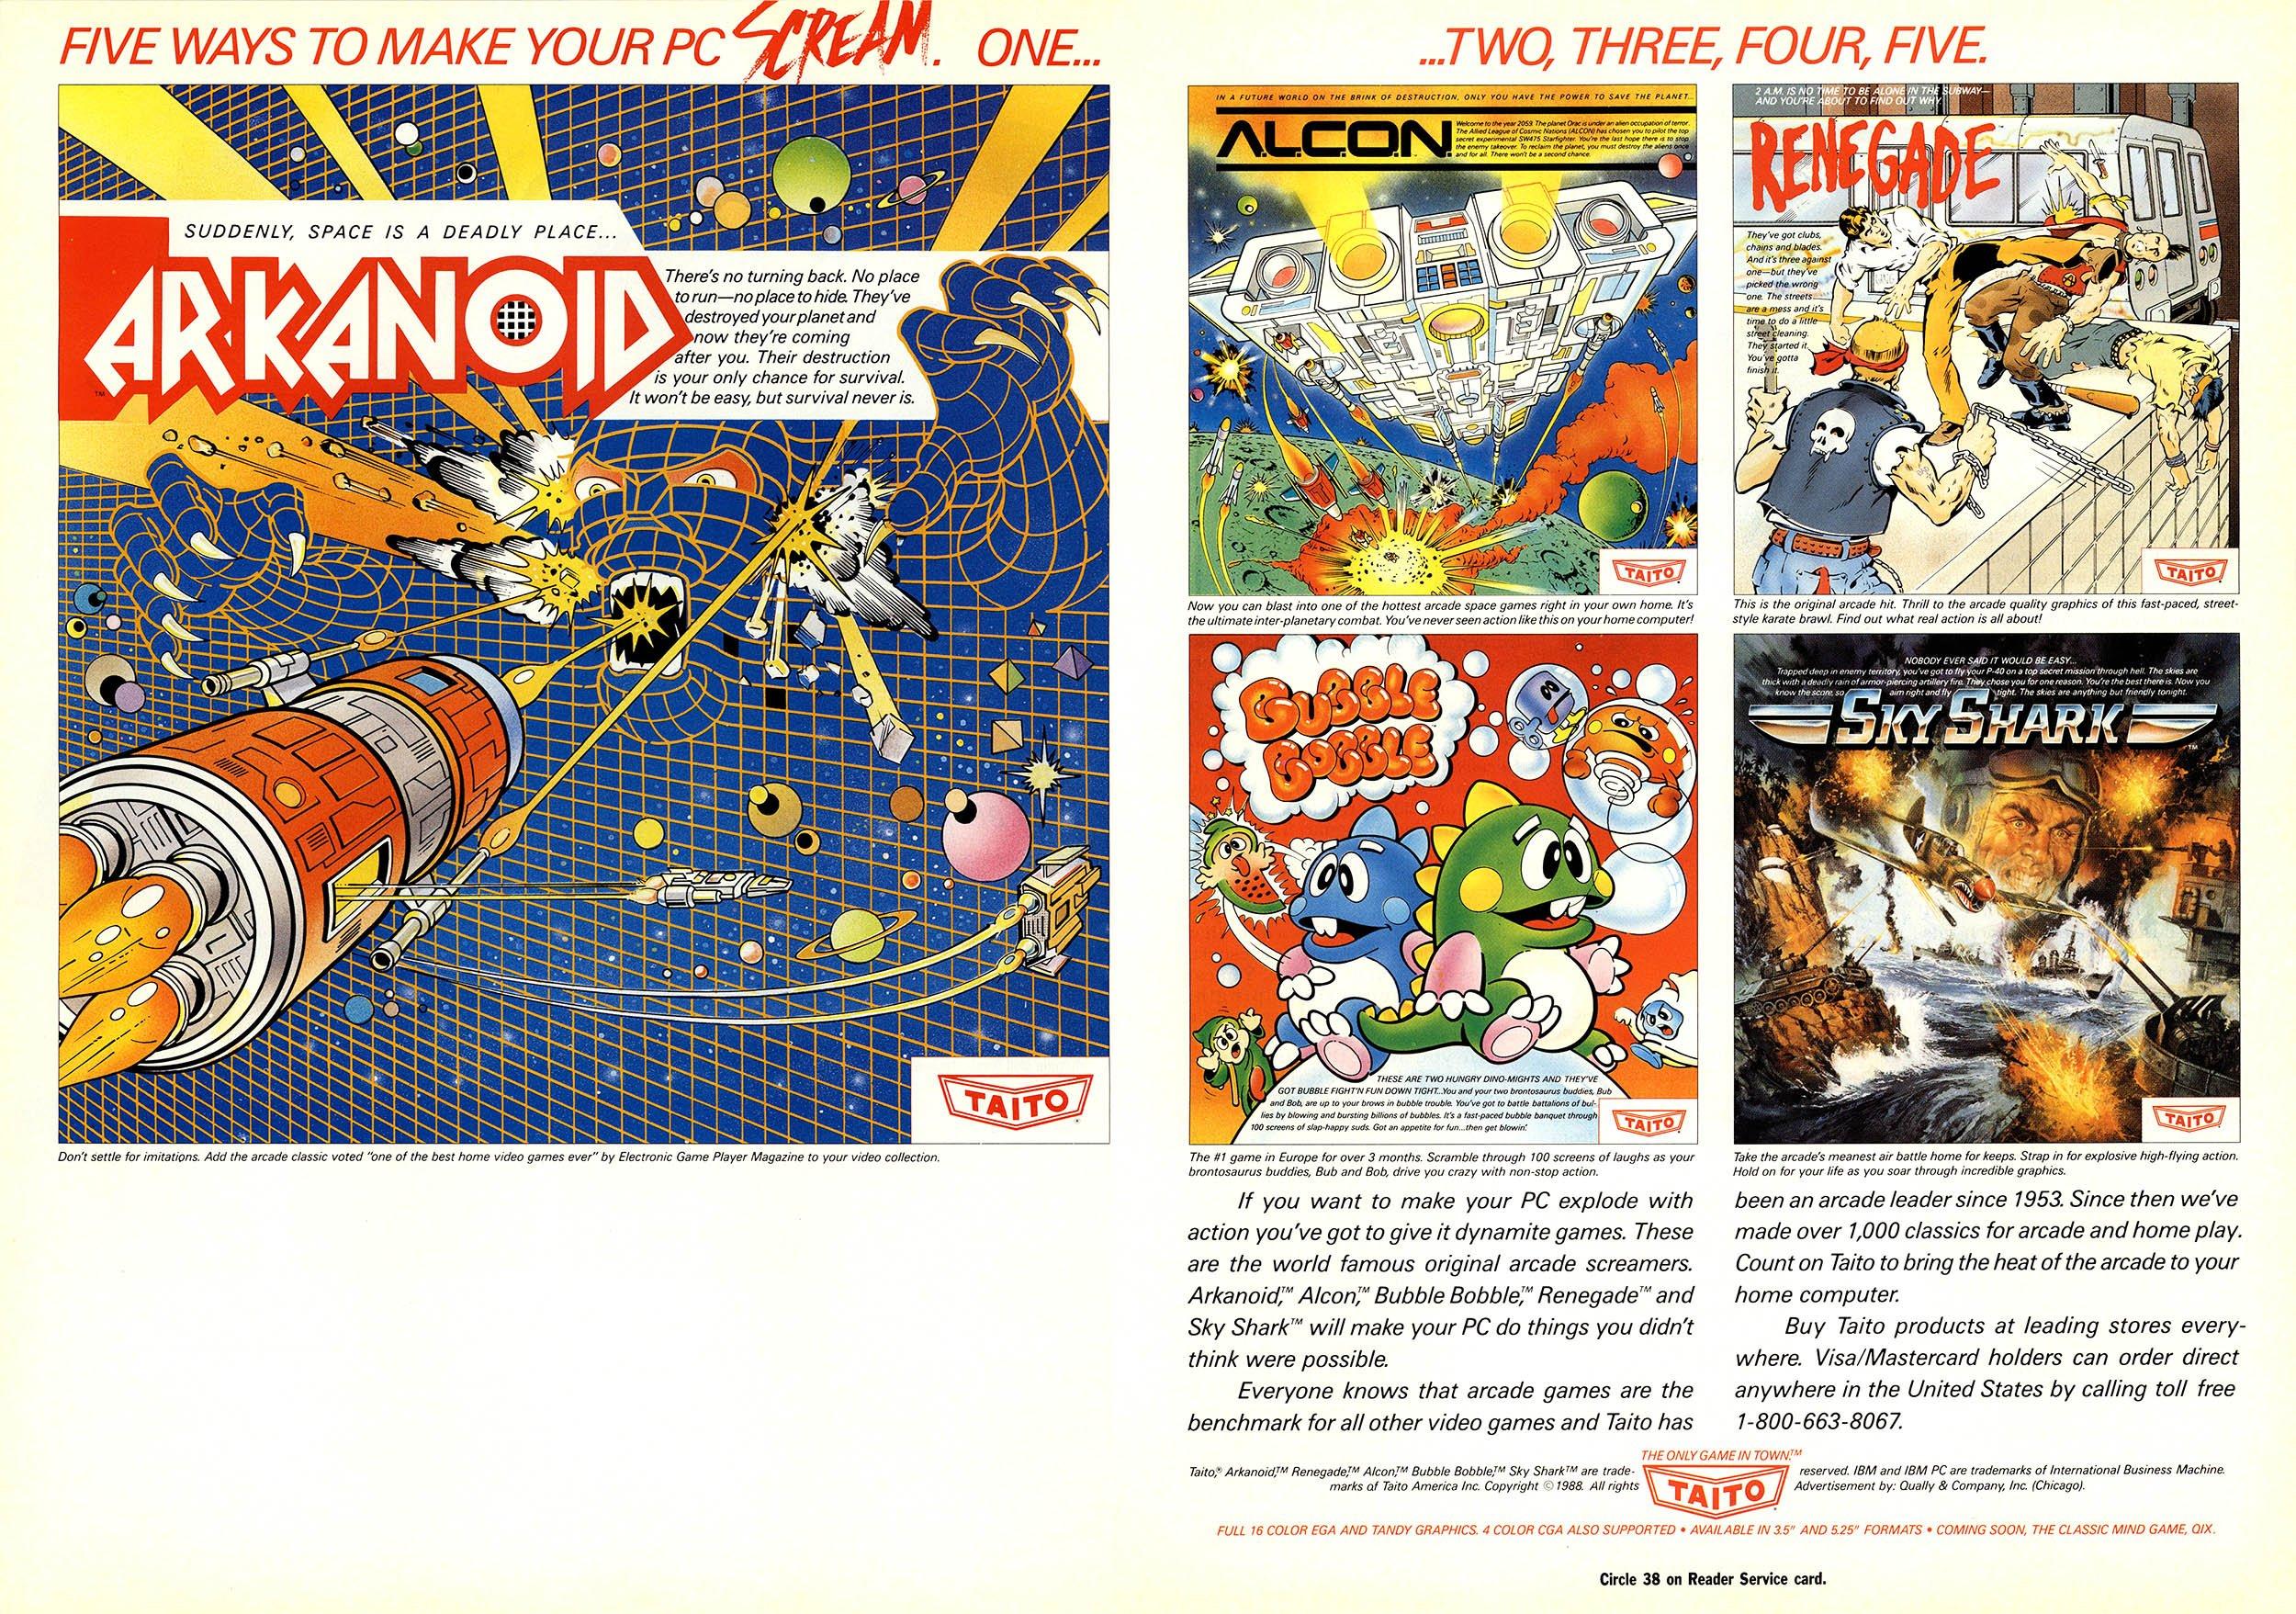 Arkanoid, Acon, Renegade, Bubble Bobble, Sky Shark